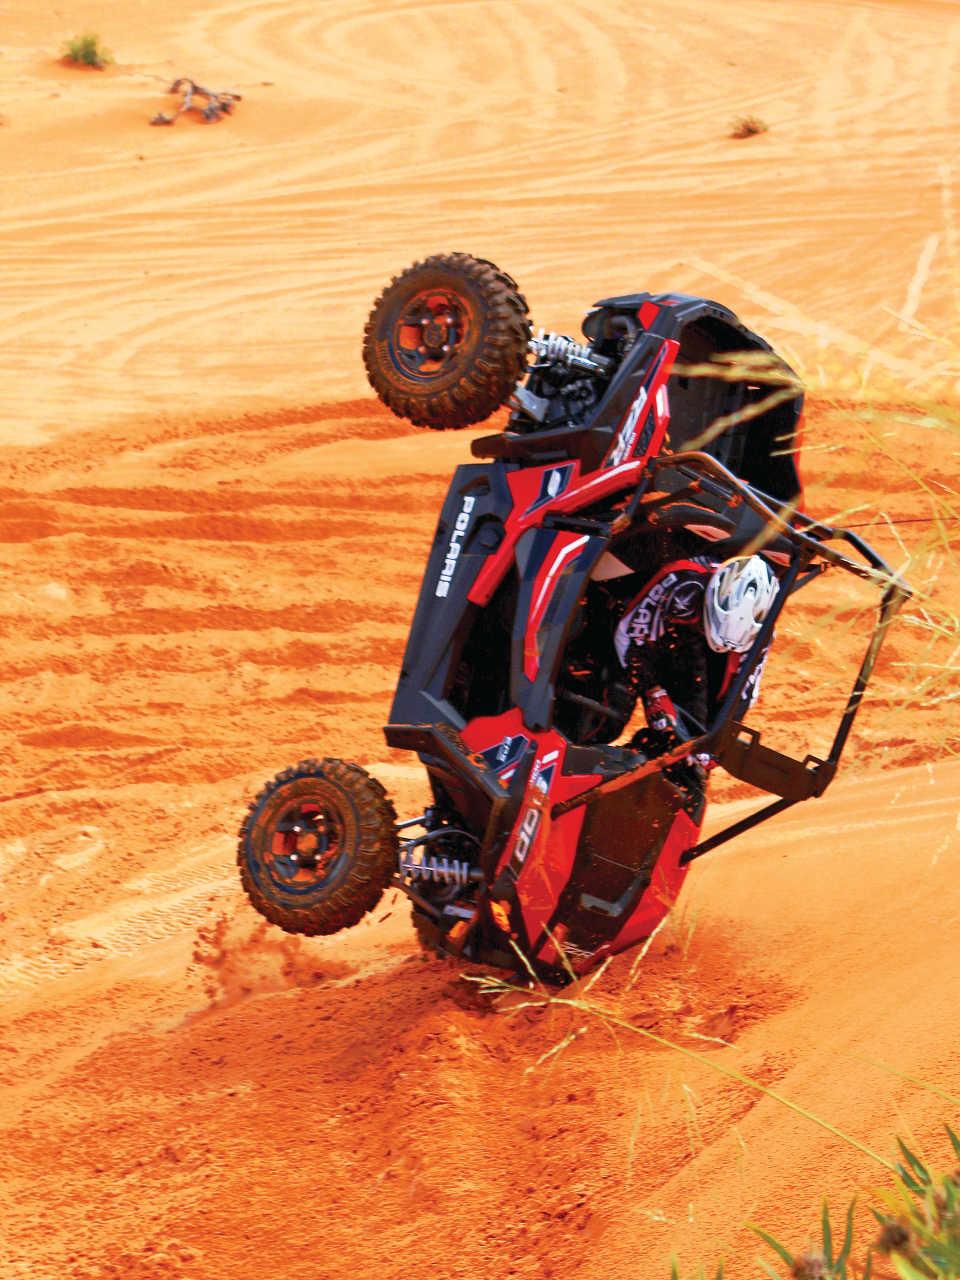 New Model Preview - The 100 Club | ATV Illustrated |Polaris Rzr Crash